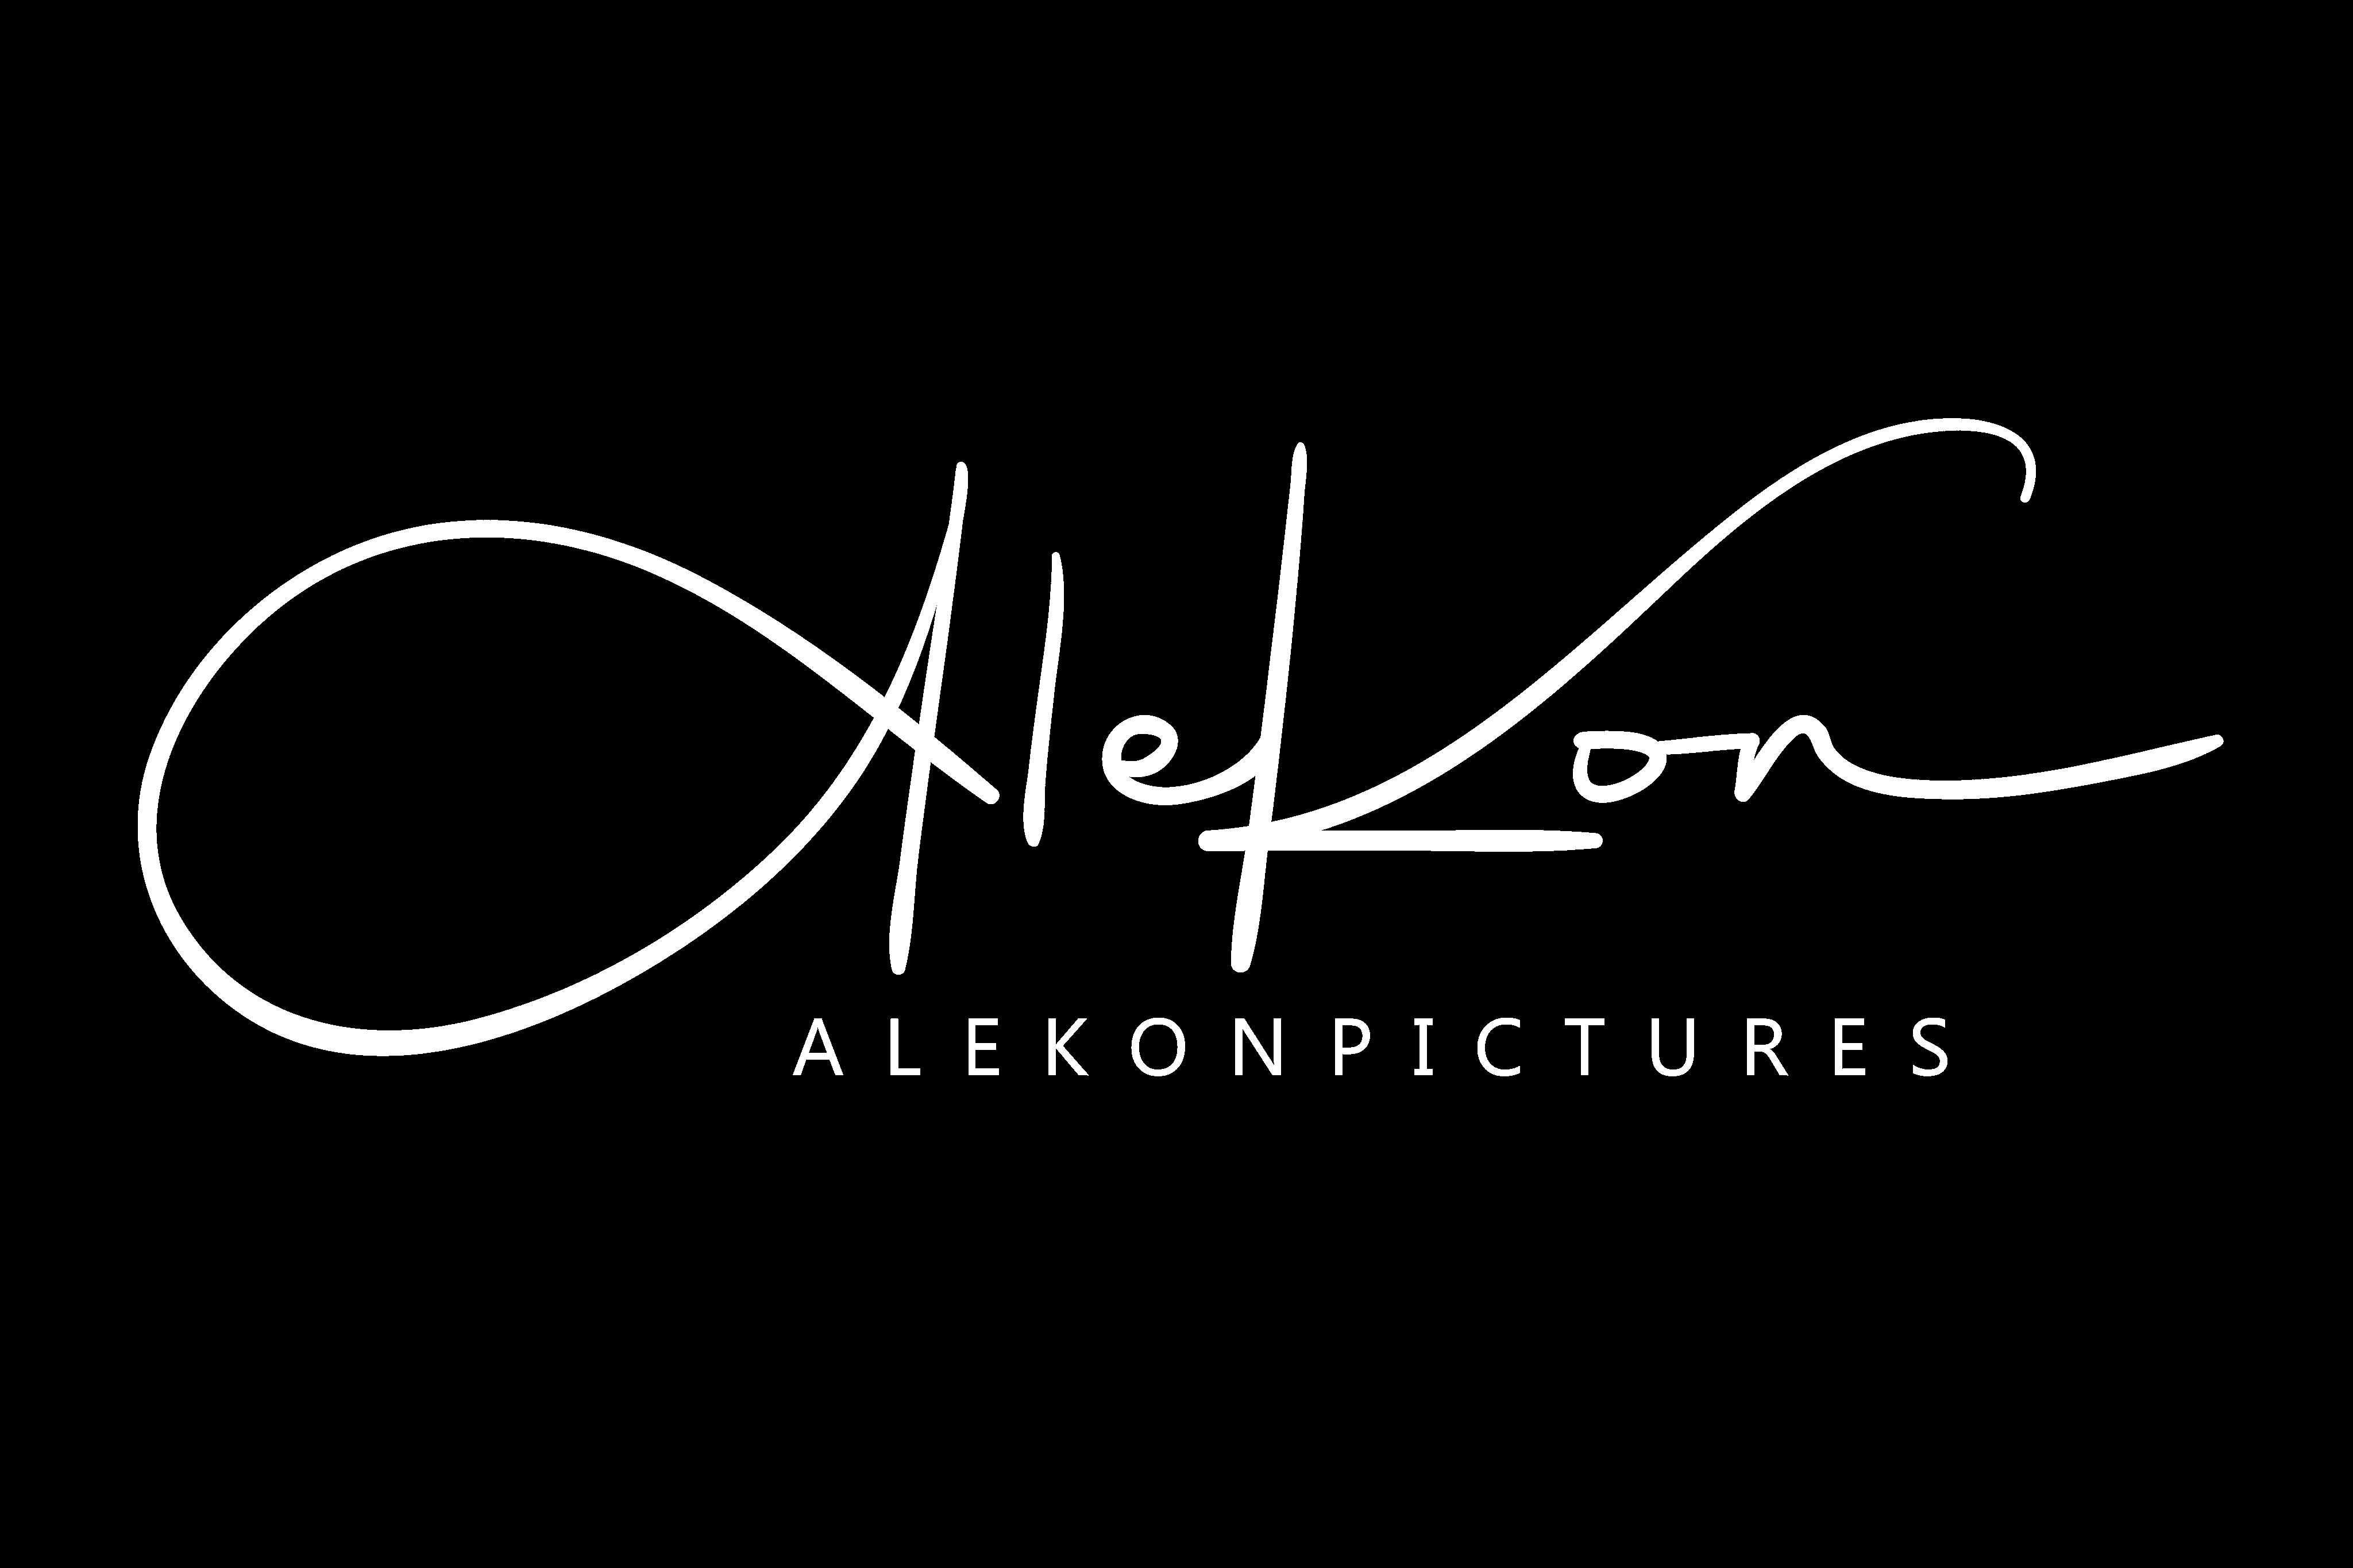 Alekon pictures